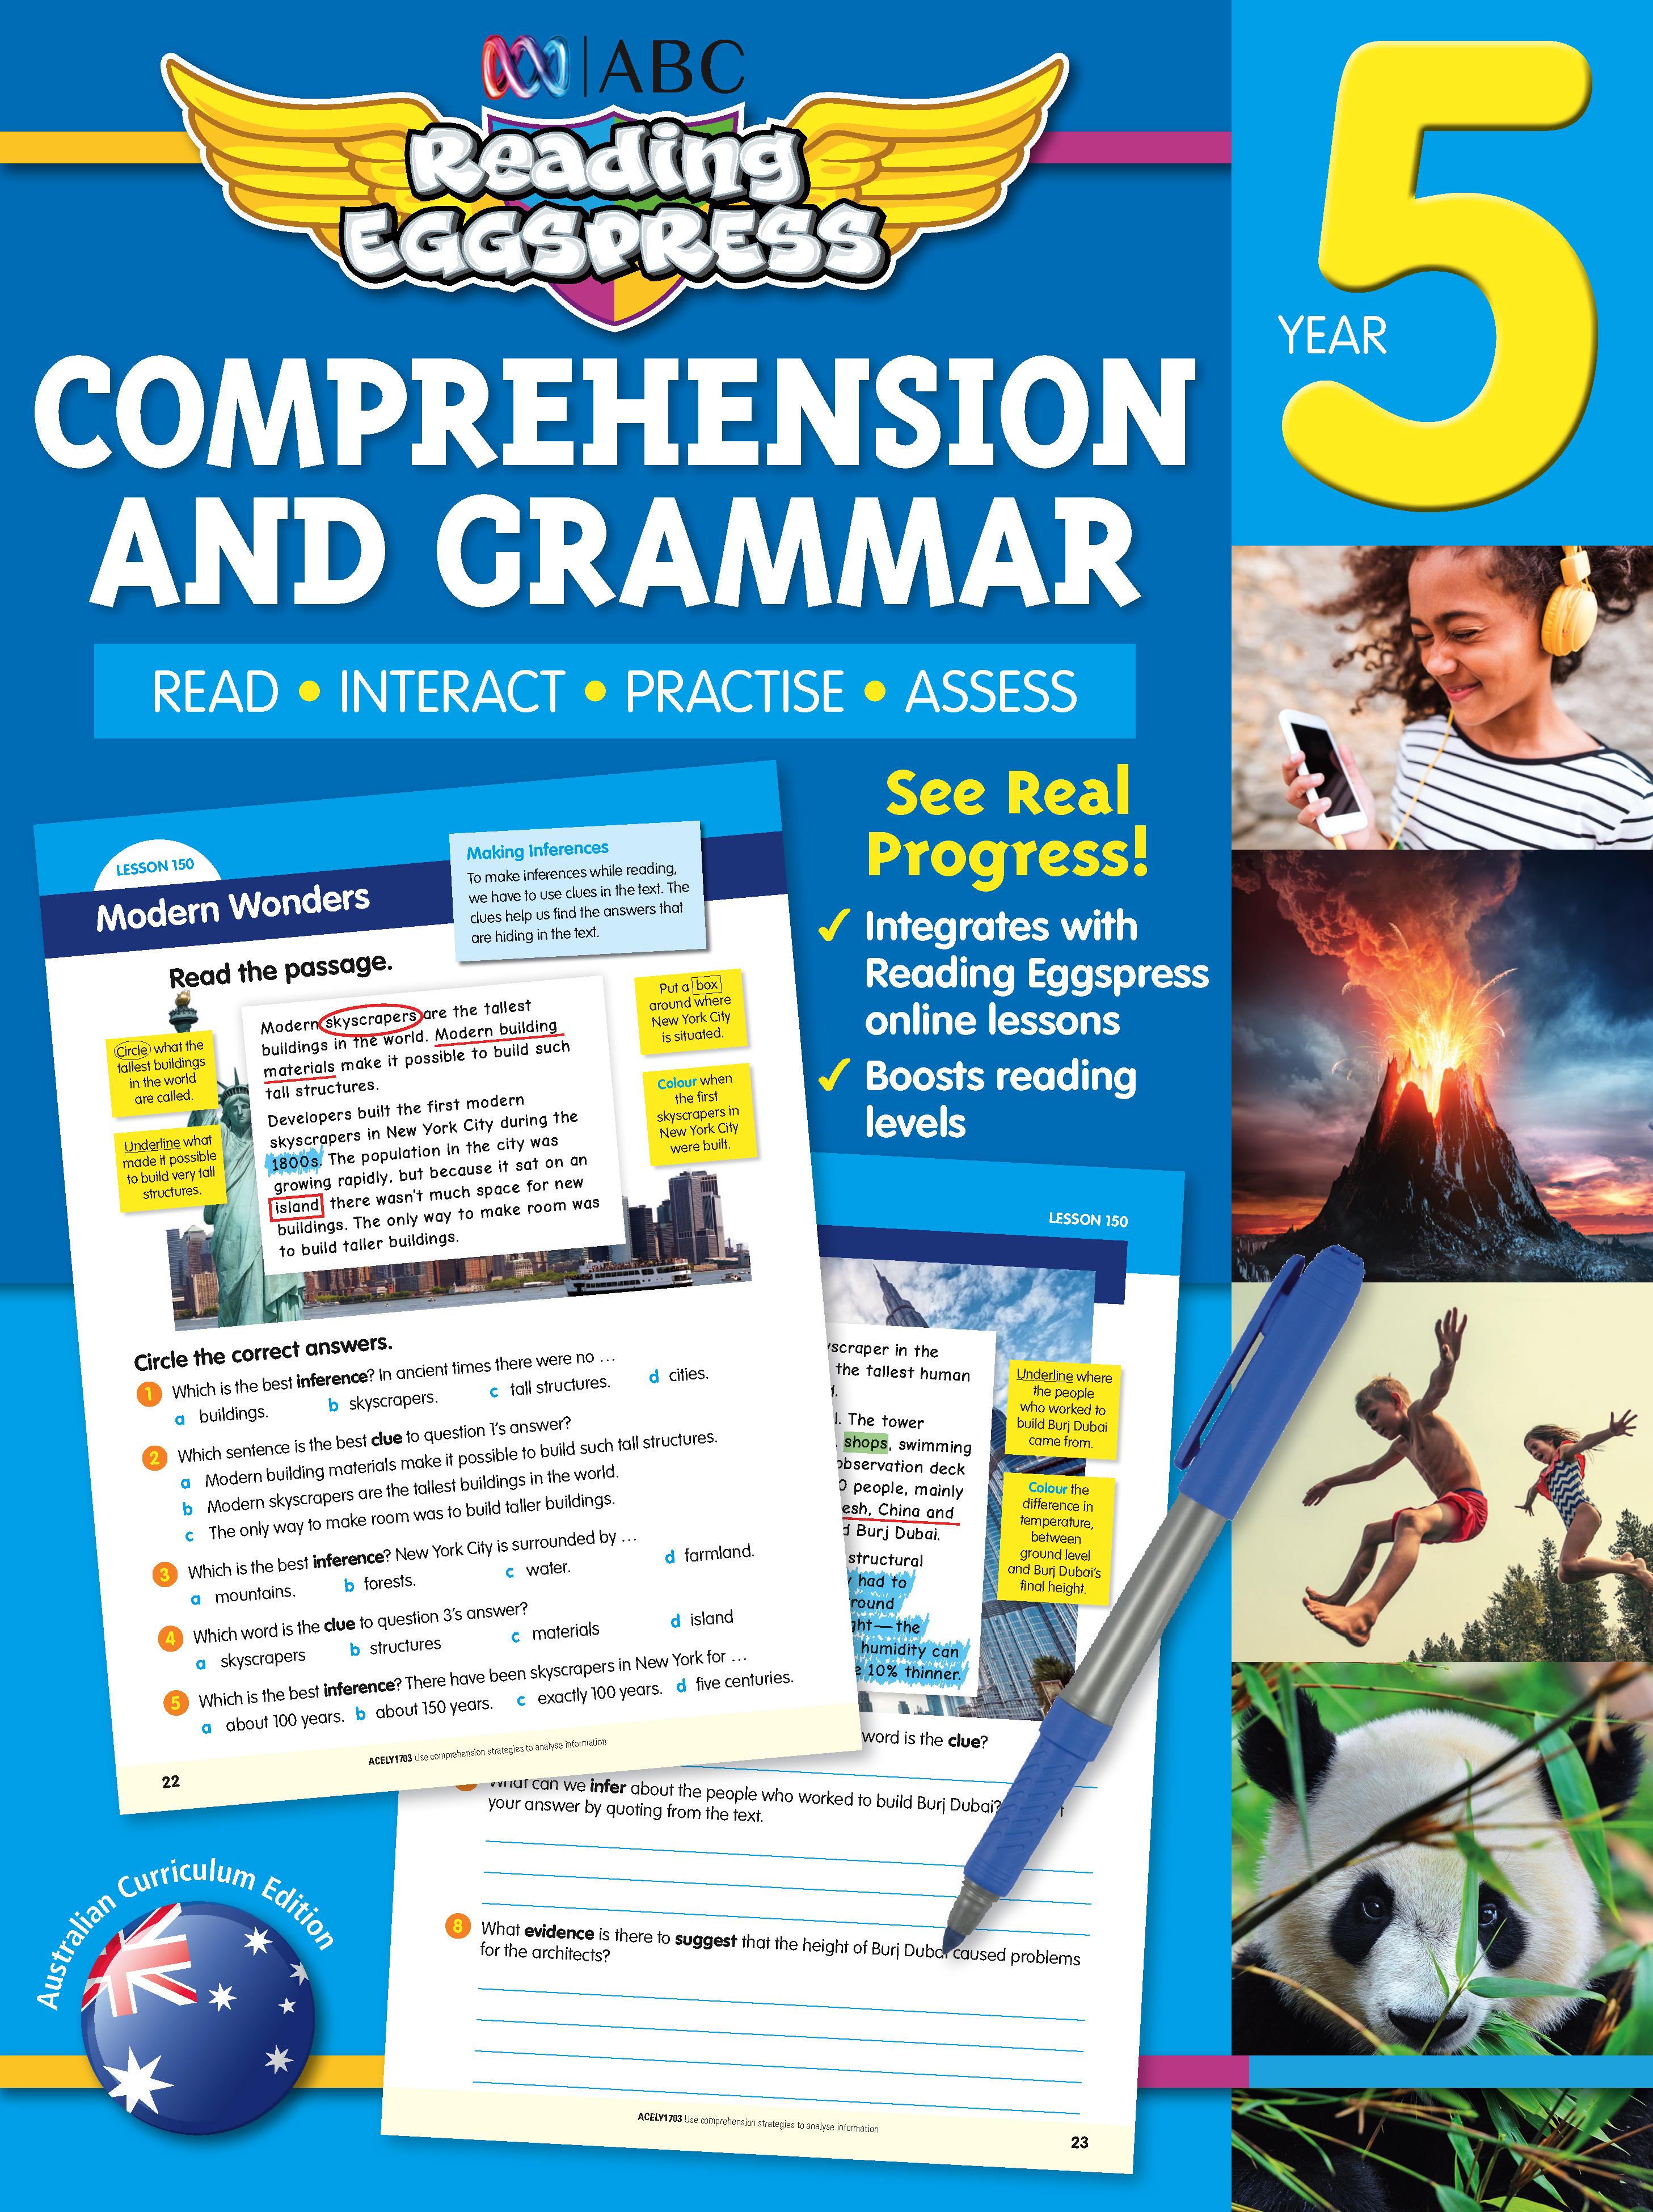 ABC Reading Eggspress Comprehension and Grammar Workbook Year 5